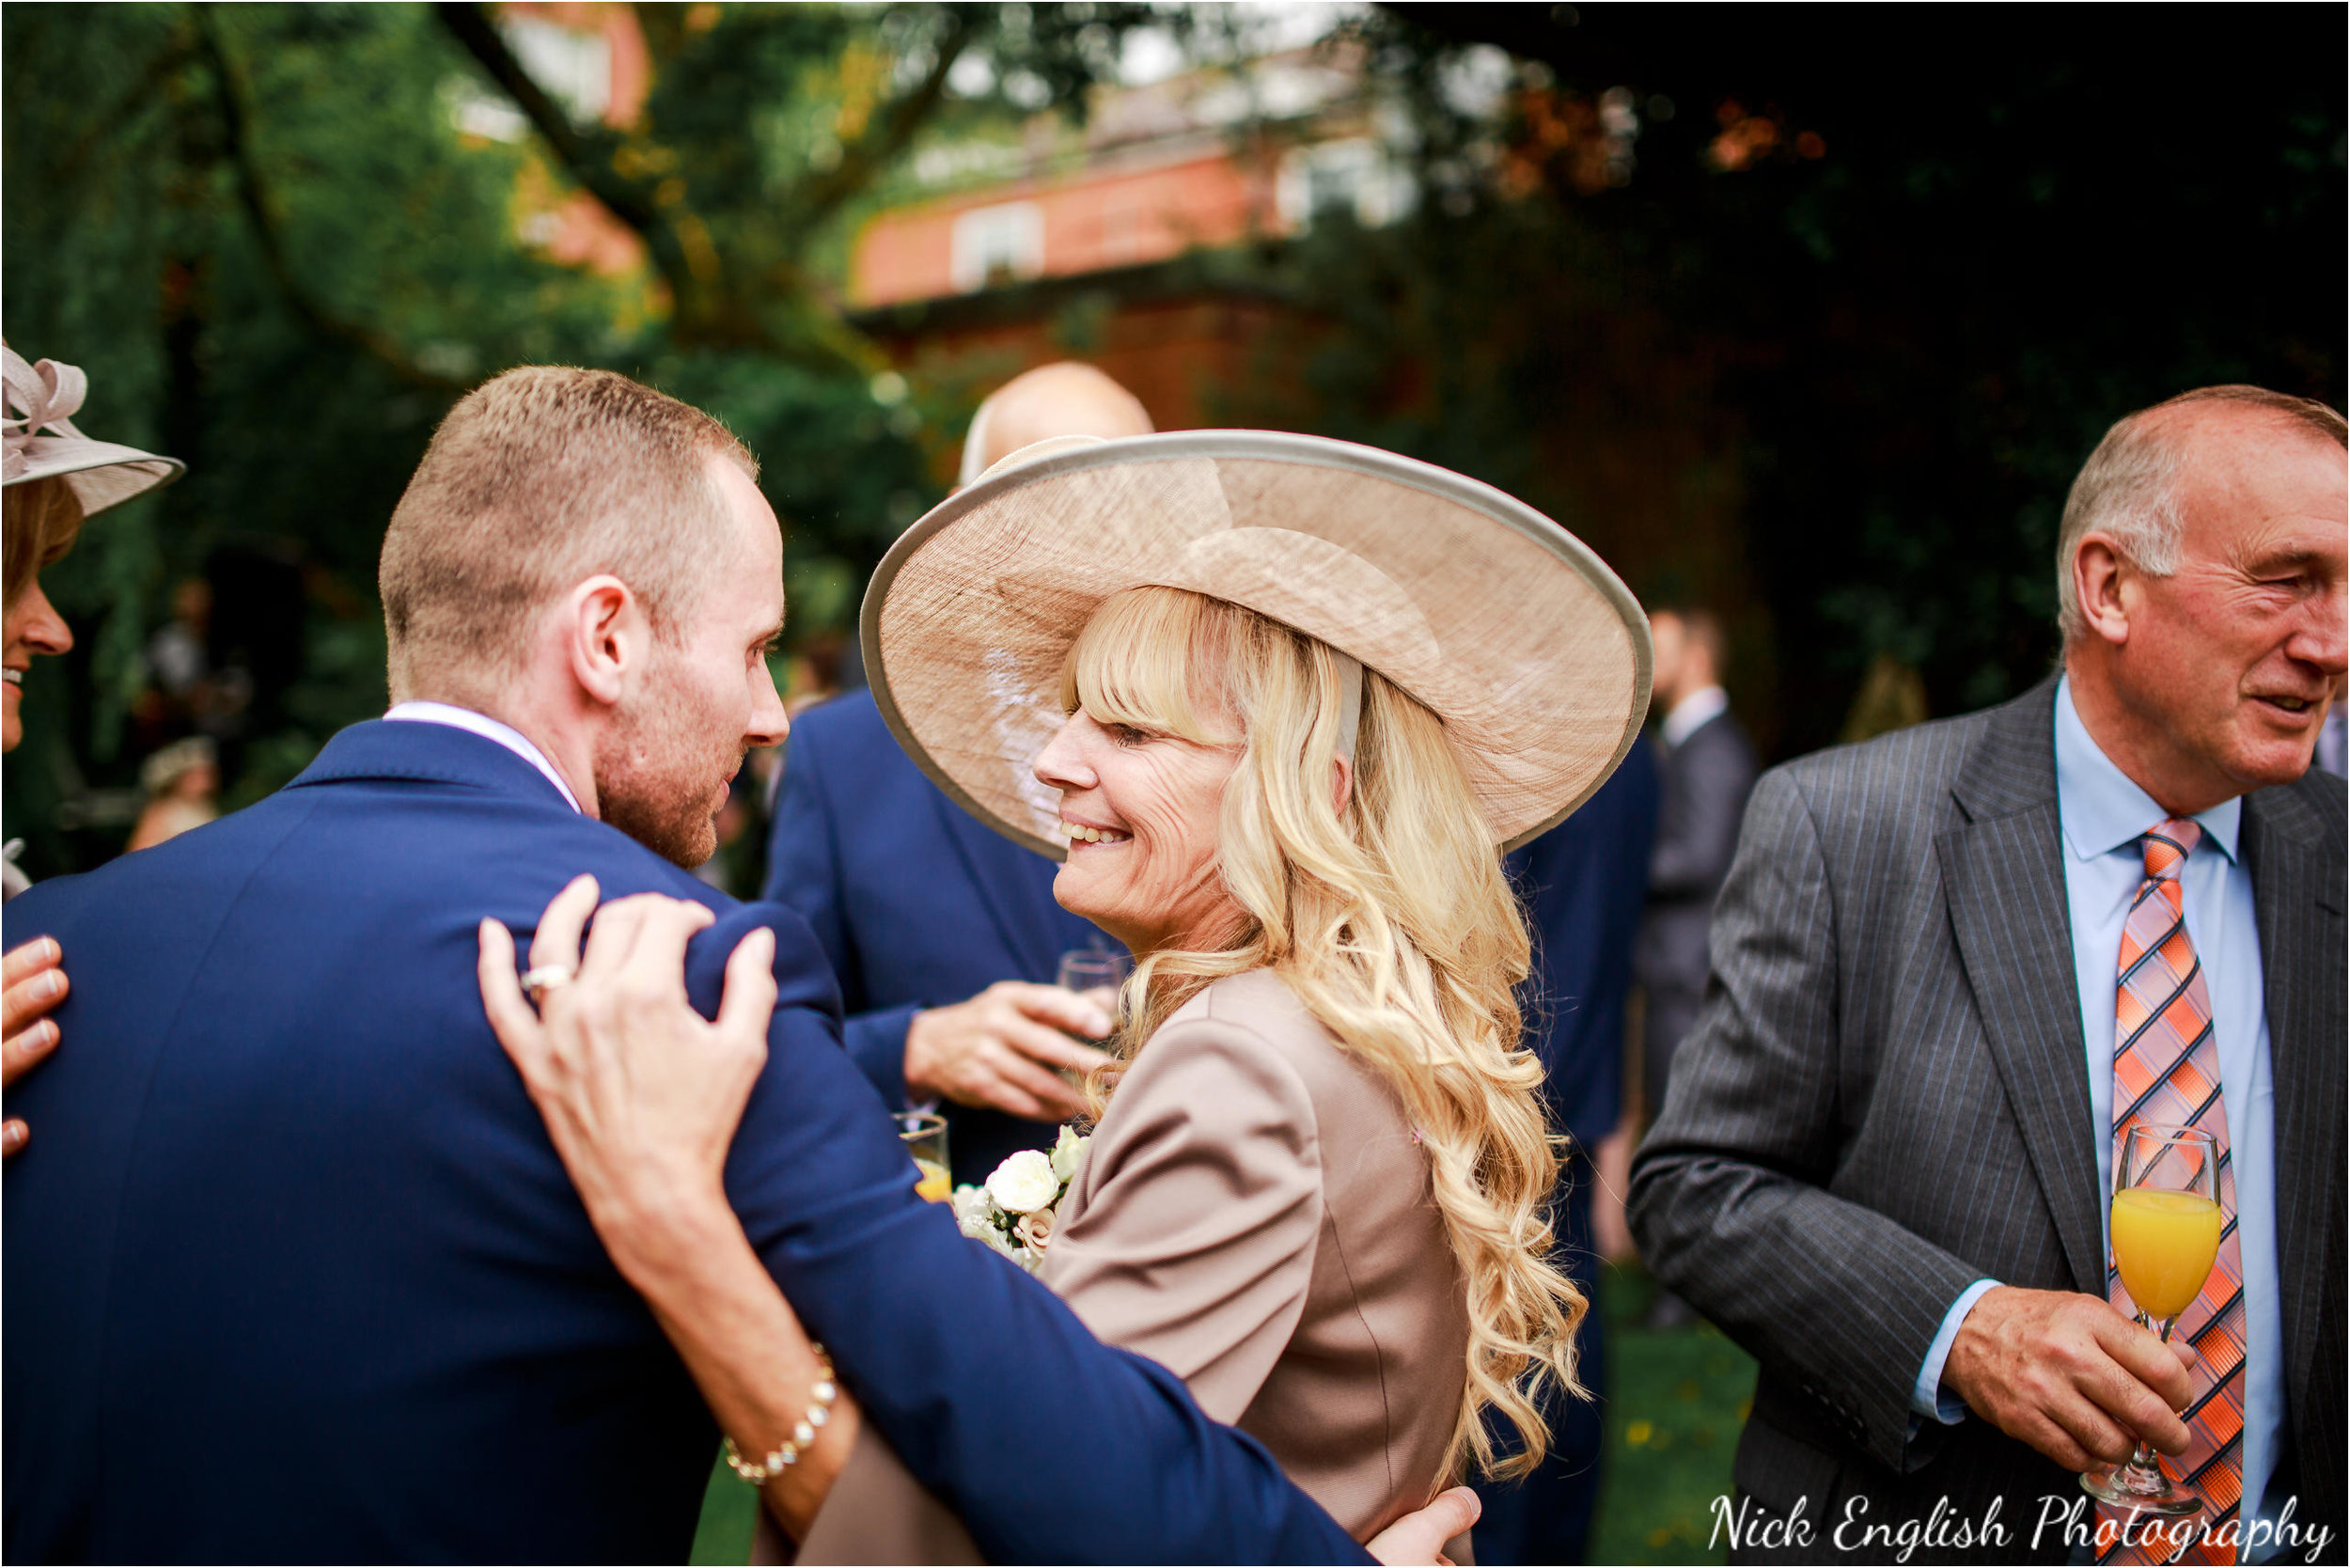 Emily David Wedding Photographs at Barton Grange Preston by Nick English Photography 99jpg.jpeg